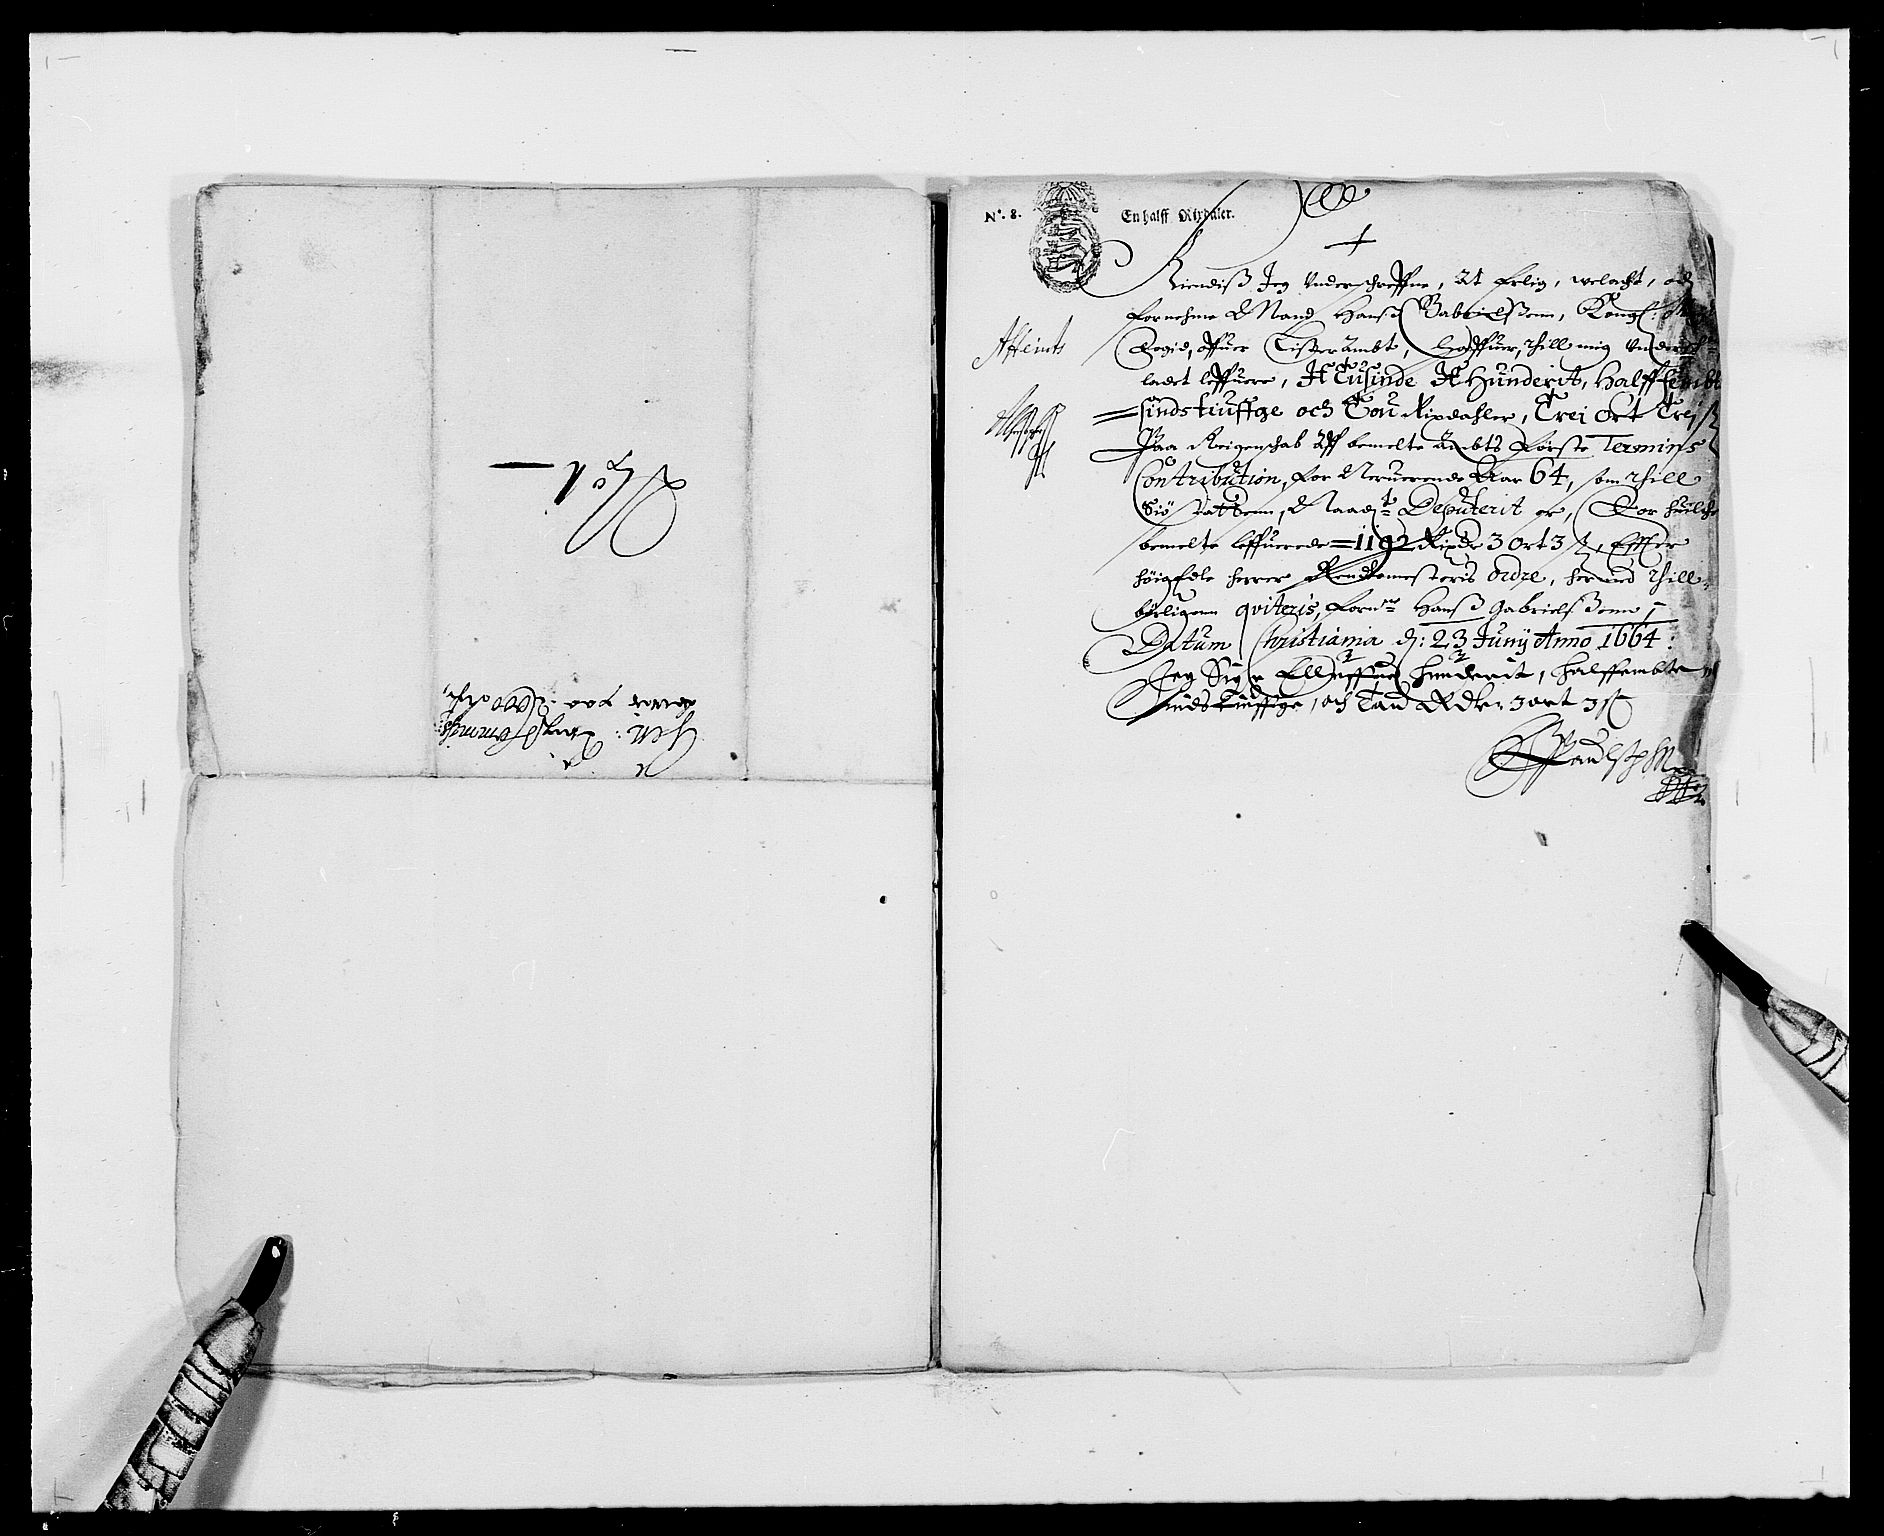 RA, Rentekammeret inntil 1814, Reviderte regnskaper, Fogderegnskap, R41/L2523: Fogderegnskap Lista, 1663-1664, s. 406